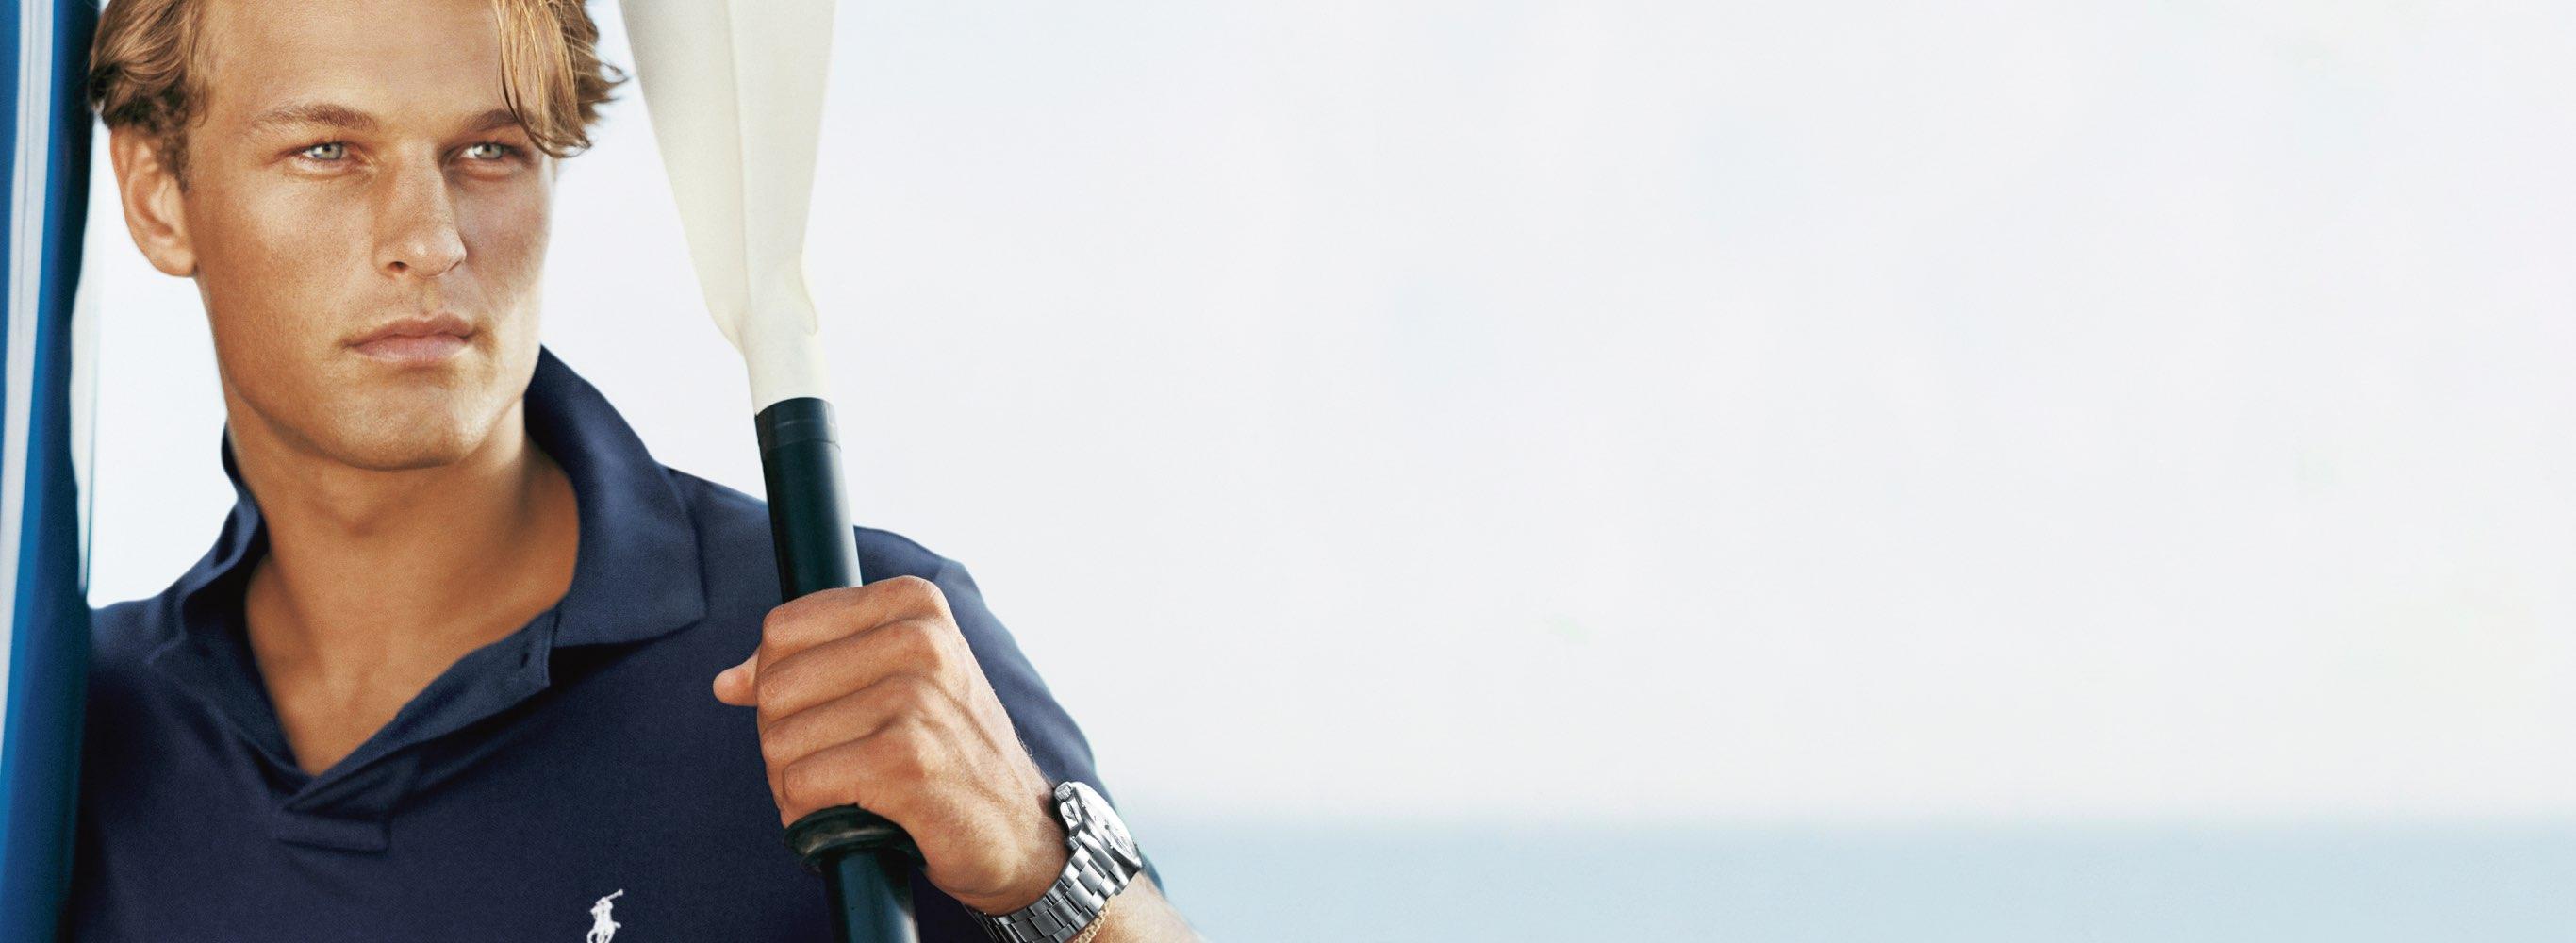 Man in navy blue Polo shirt